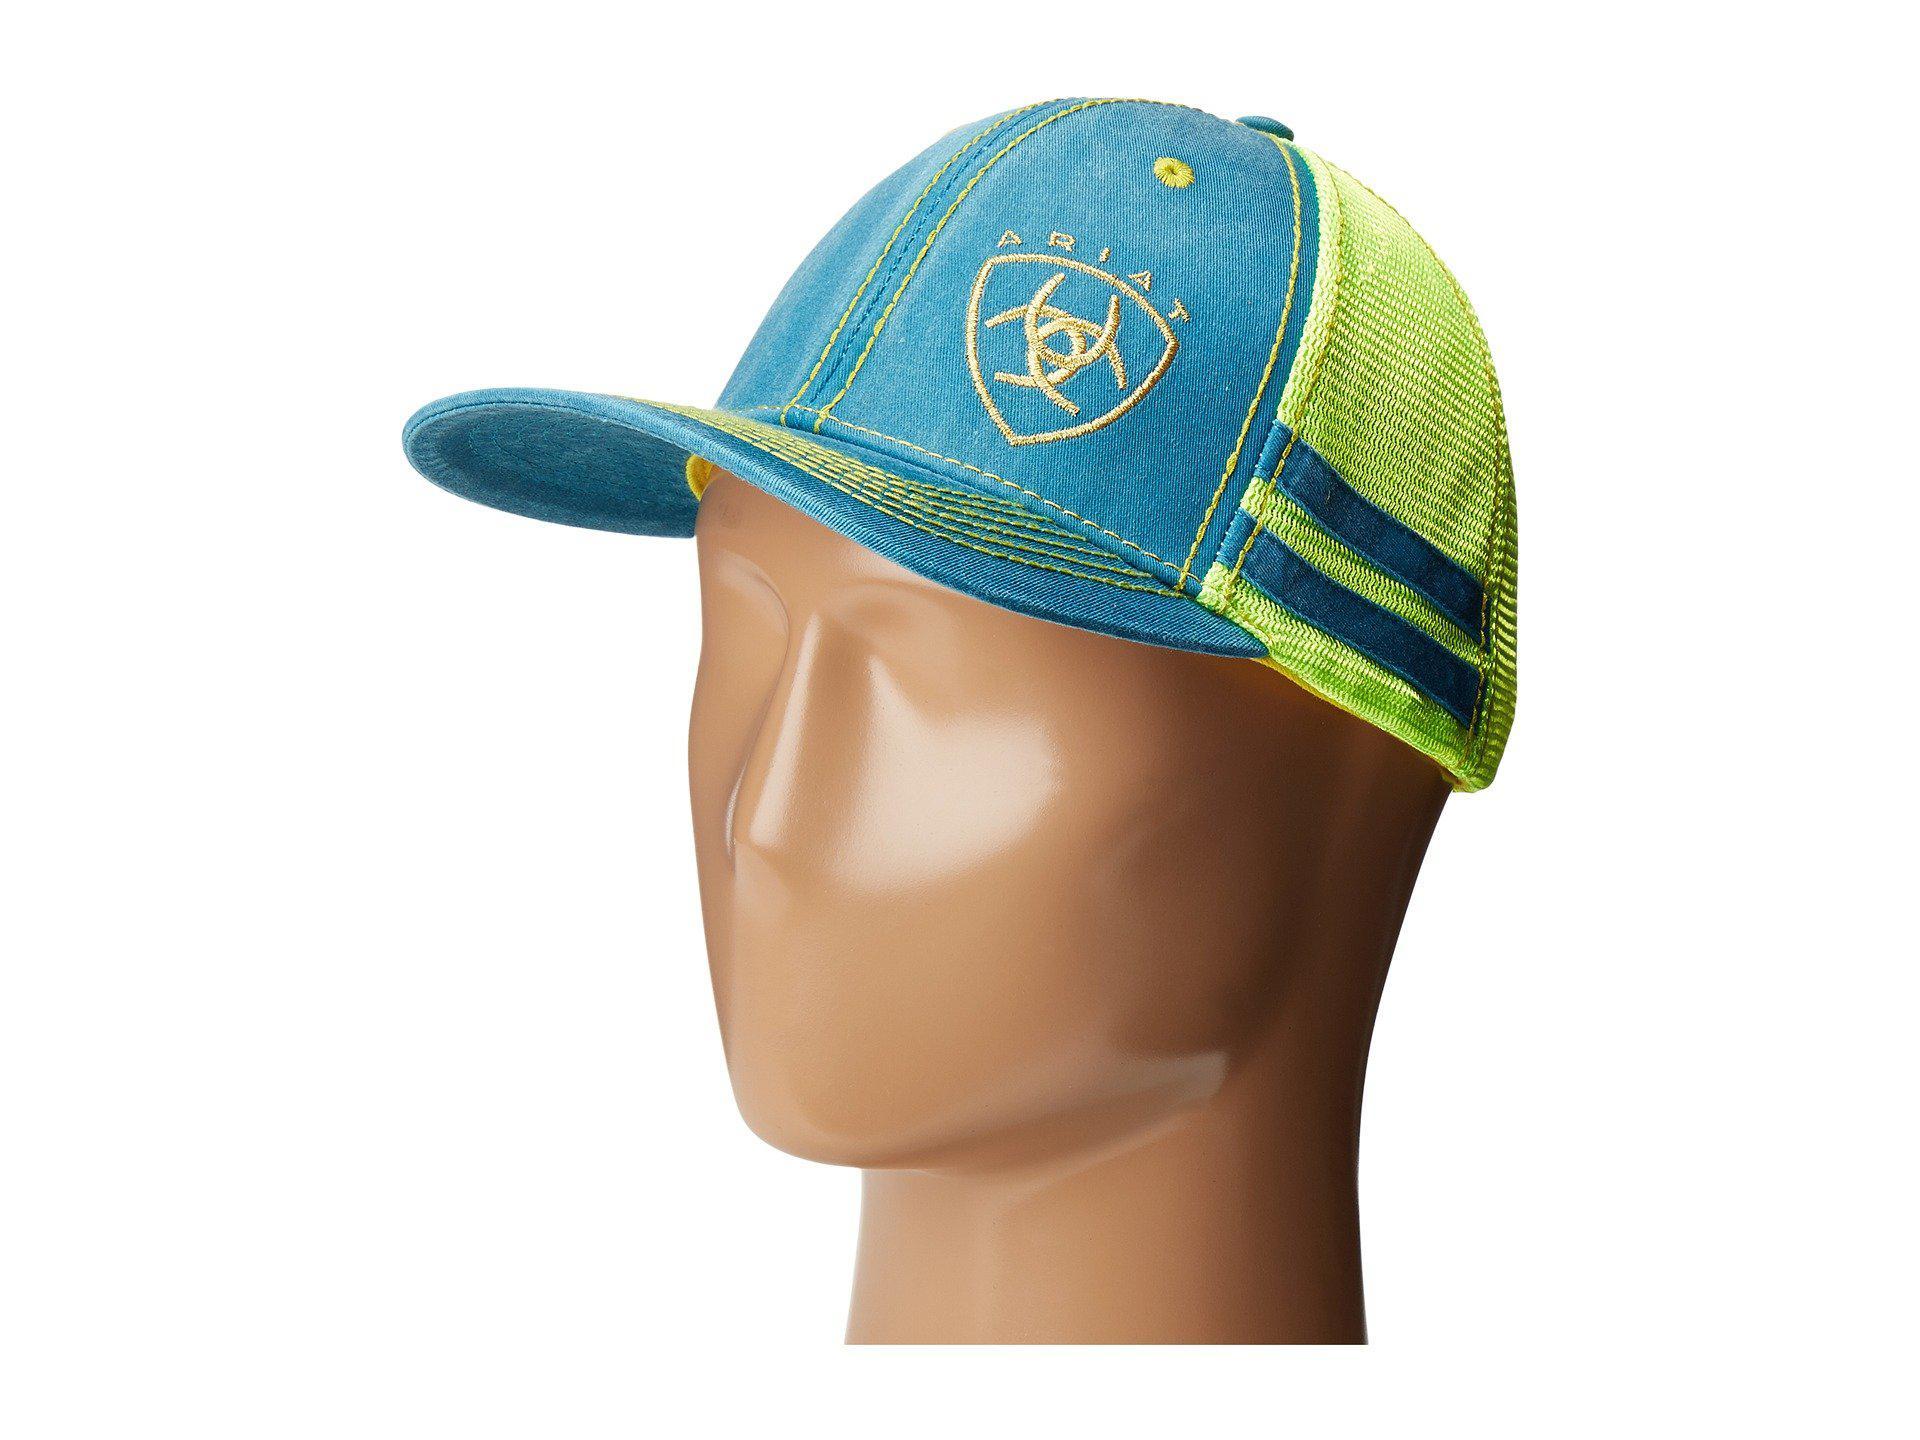 Lyst - Ariat 1594733 (turquoise) Caps 5a995cc6486